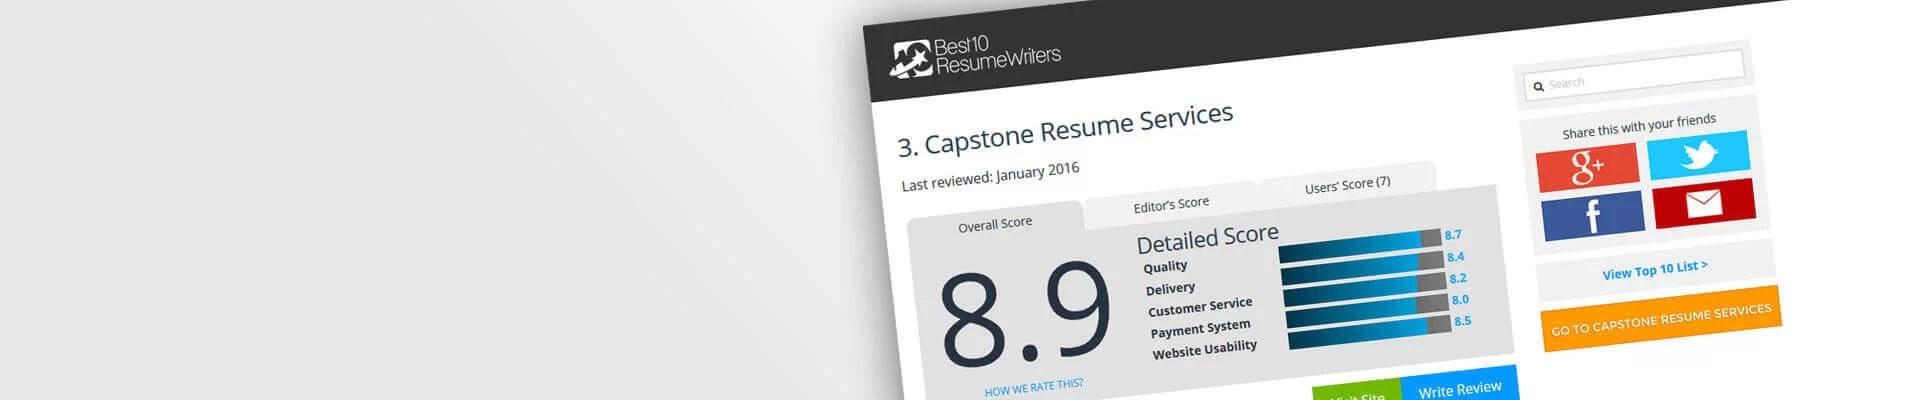 10 best resume writers template